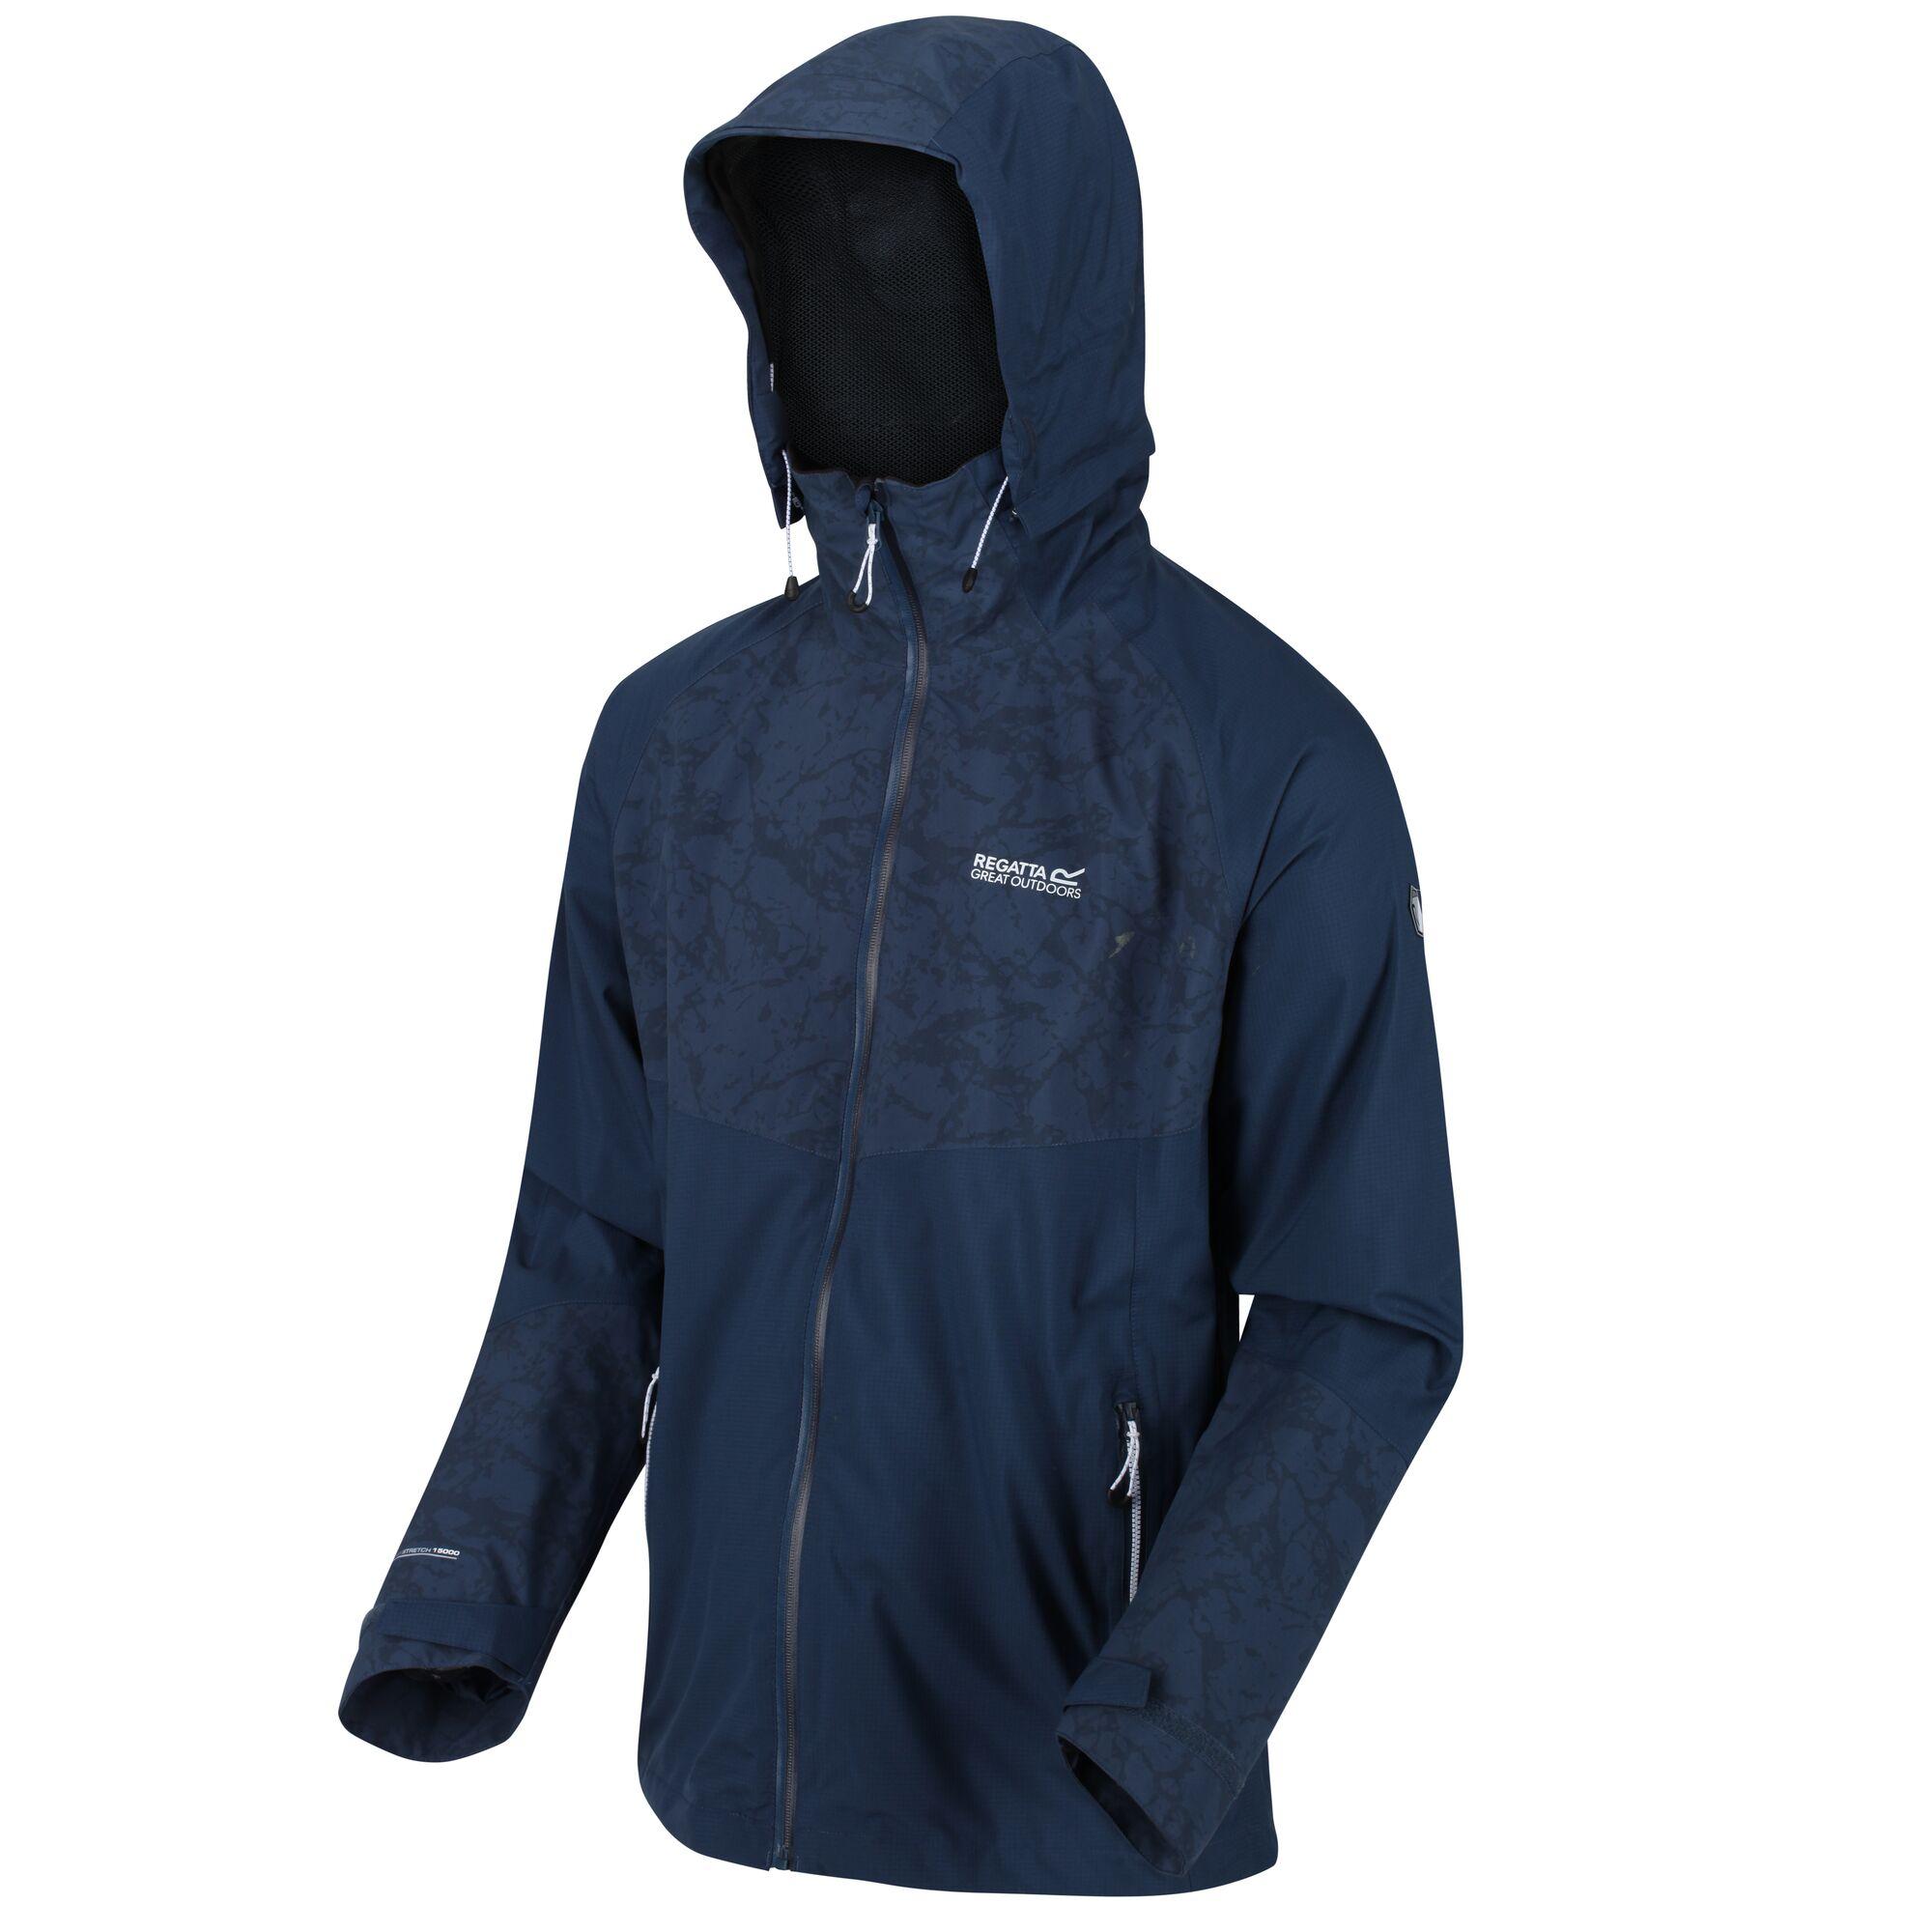 Regatta-Men-039-s-Oklahoma-V-Reflective-Waterproof-Hooded-Walking-Jacket-Blue thumbnail 9